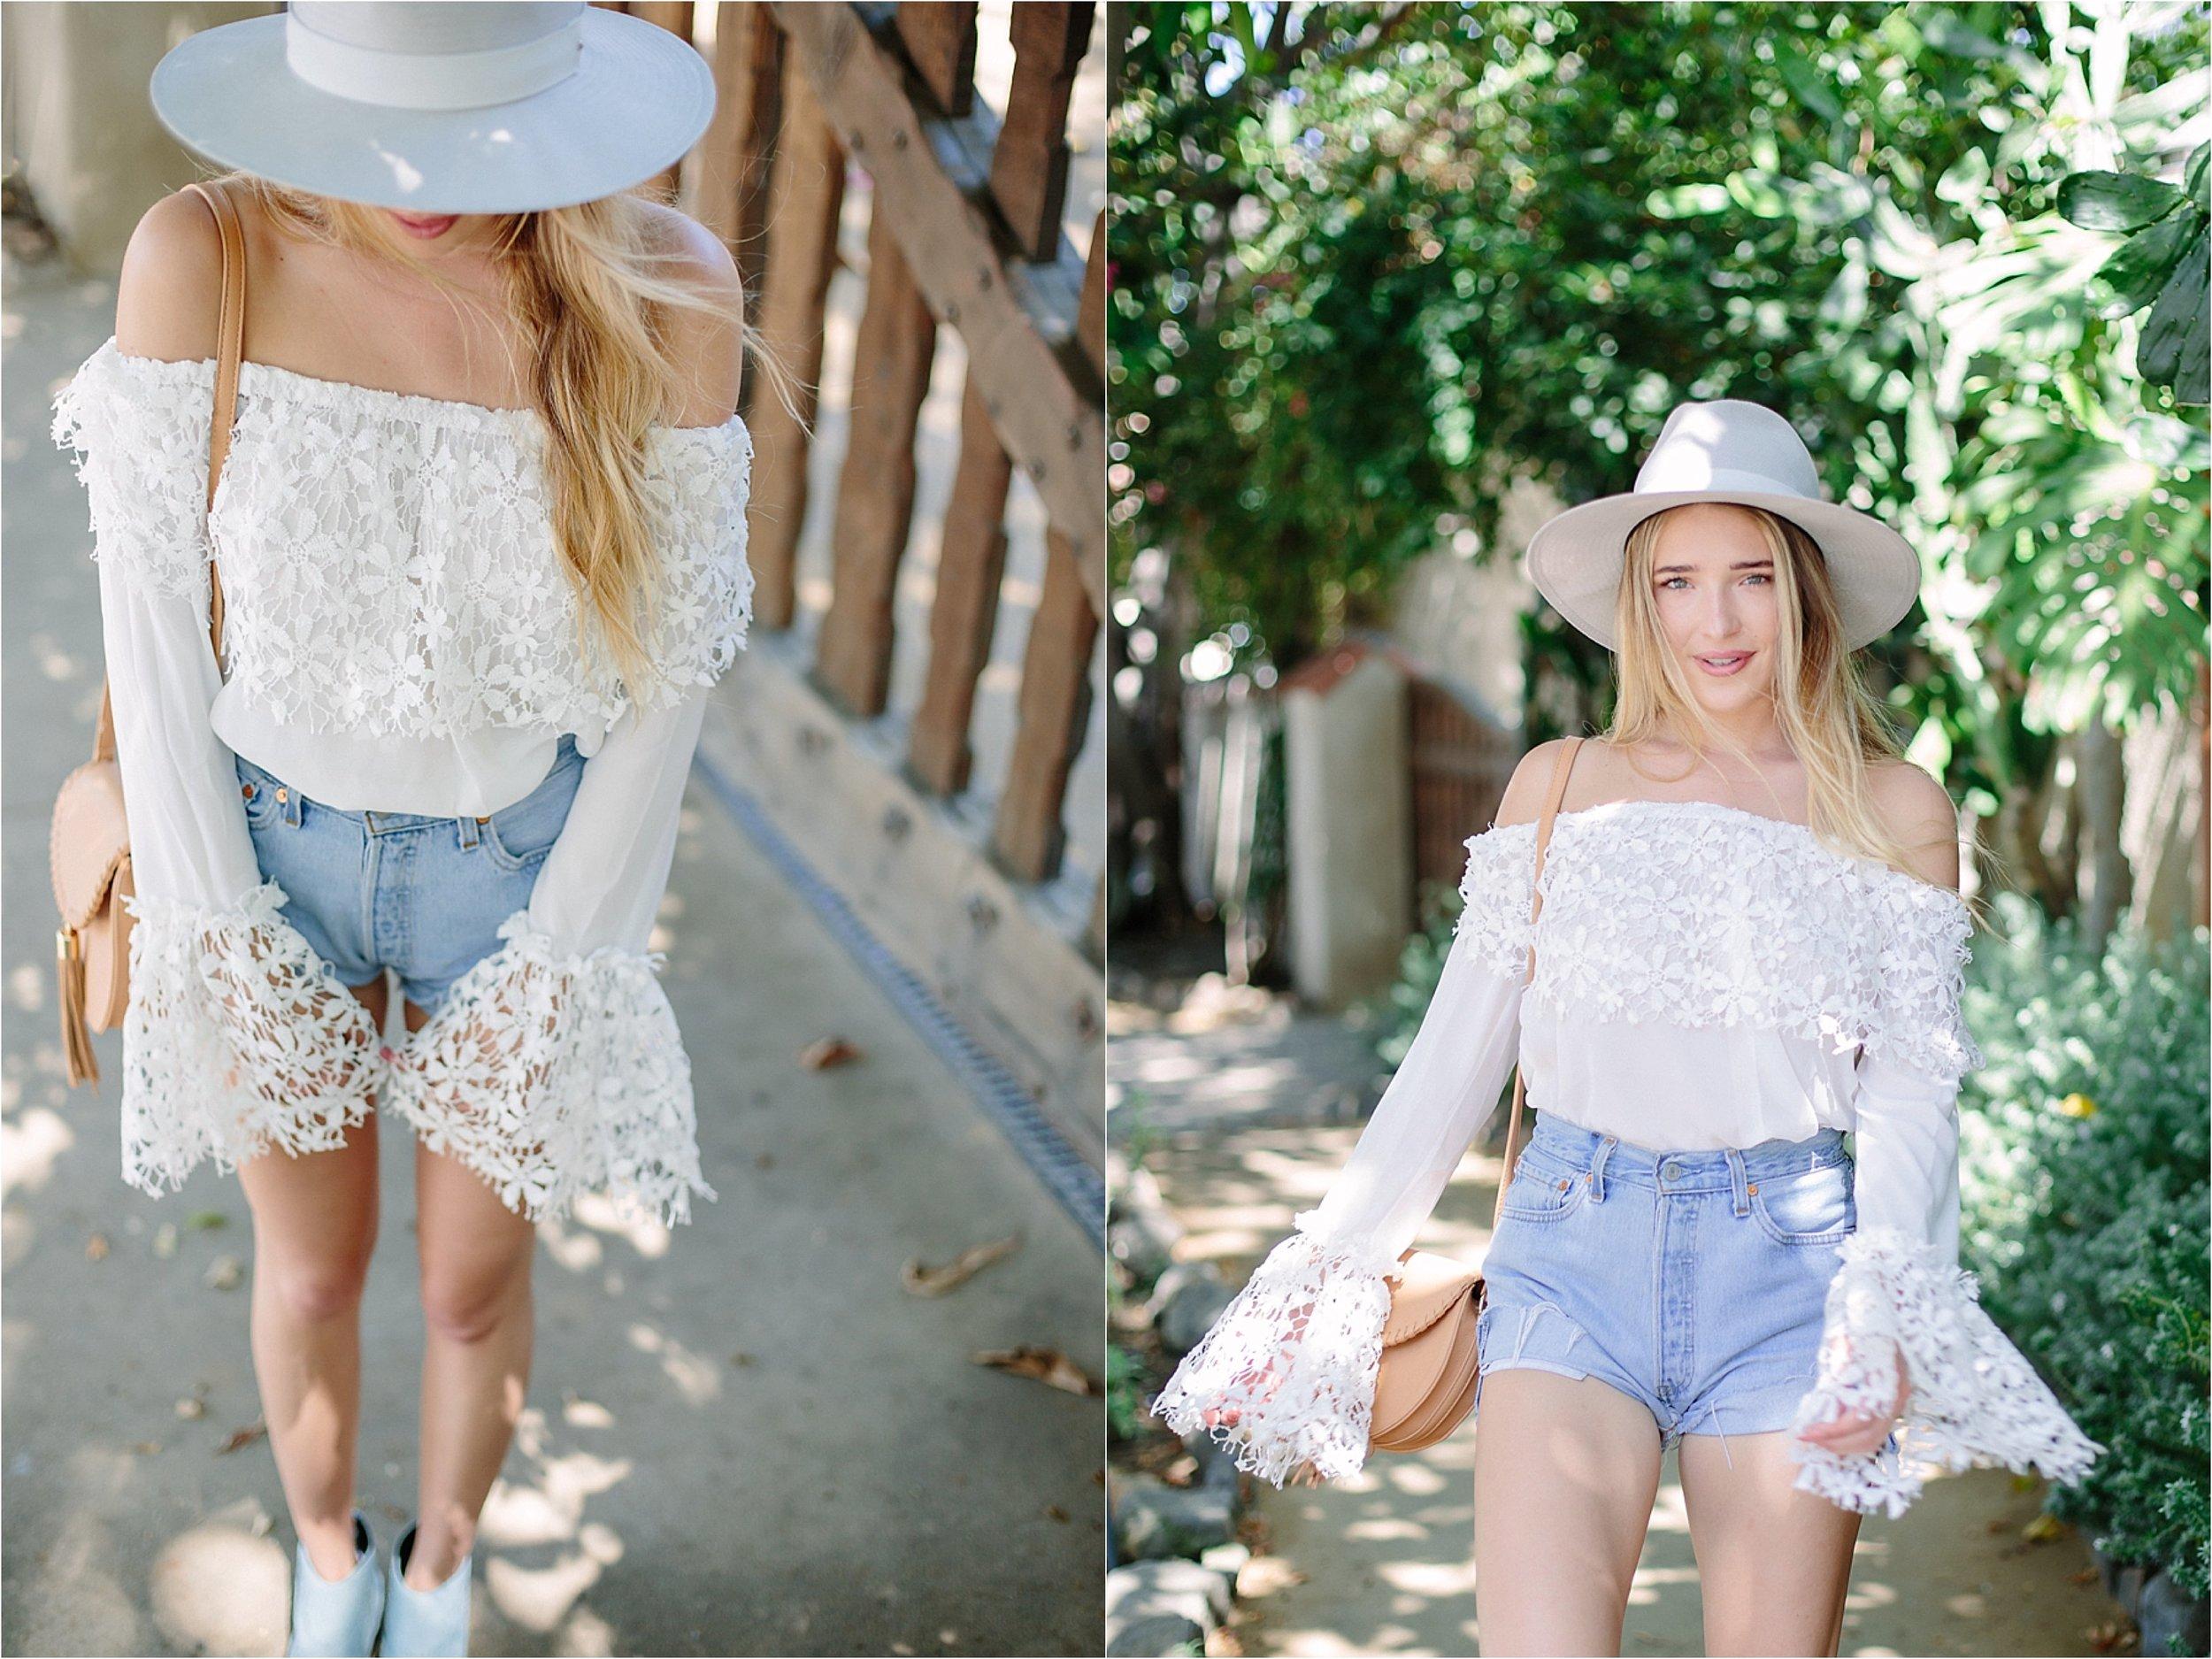 Los Angeles Fashion Kin K Hats Detail Photo